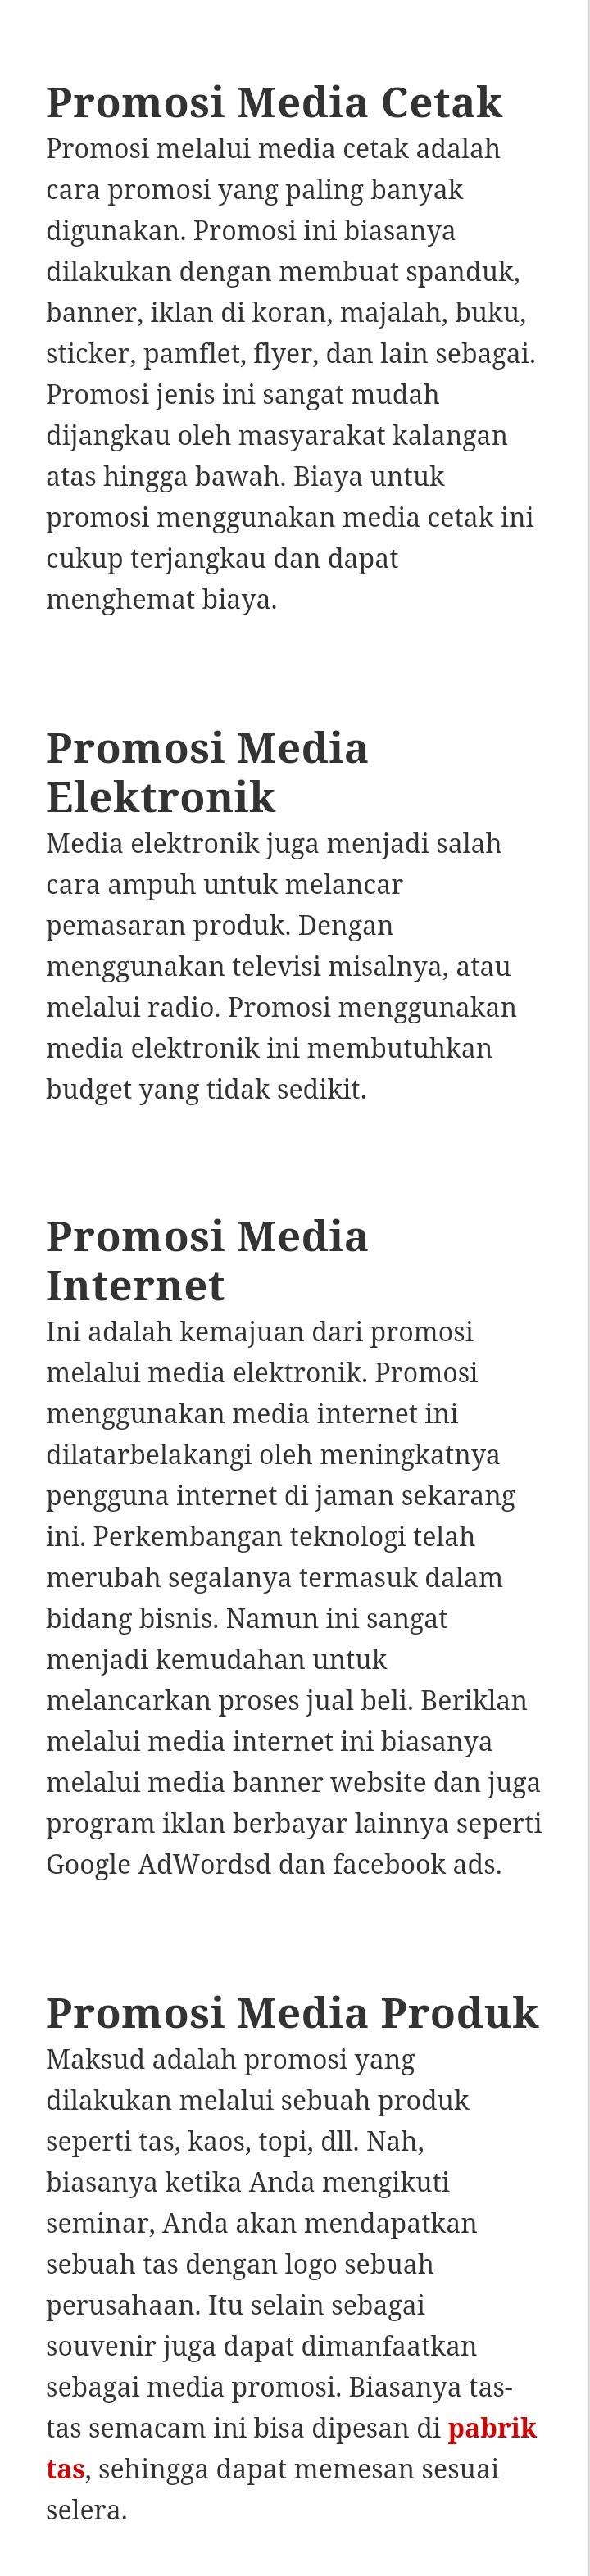 Menerapkan Media Promosi Pemasaran Brainly Co Id